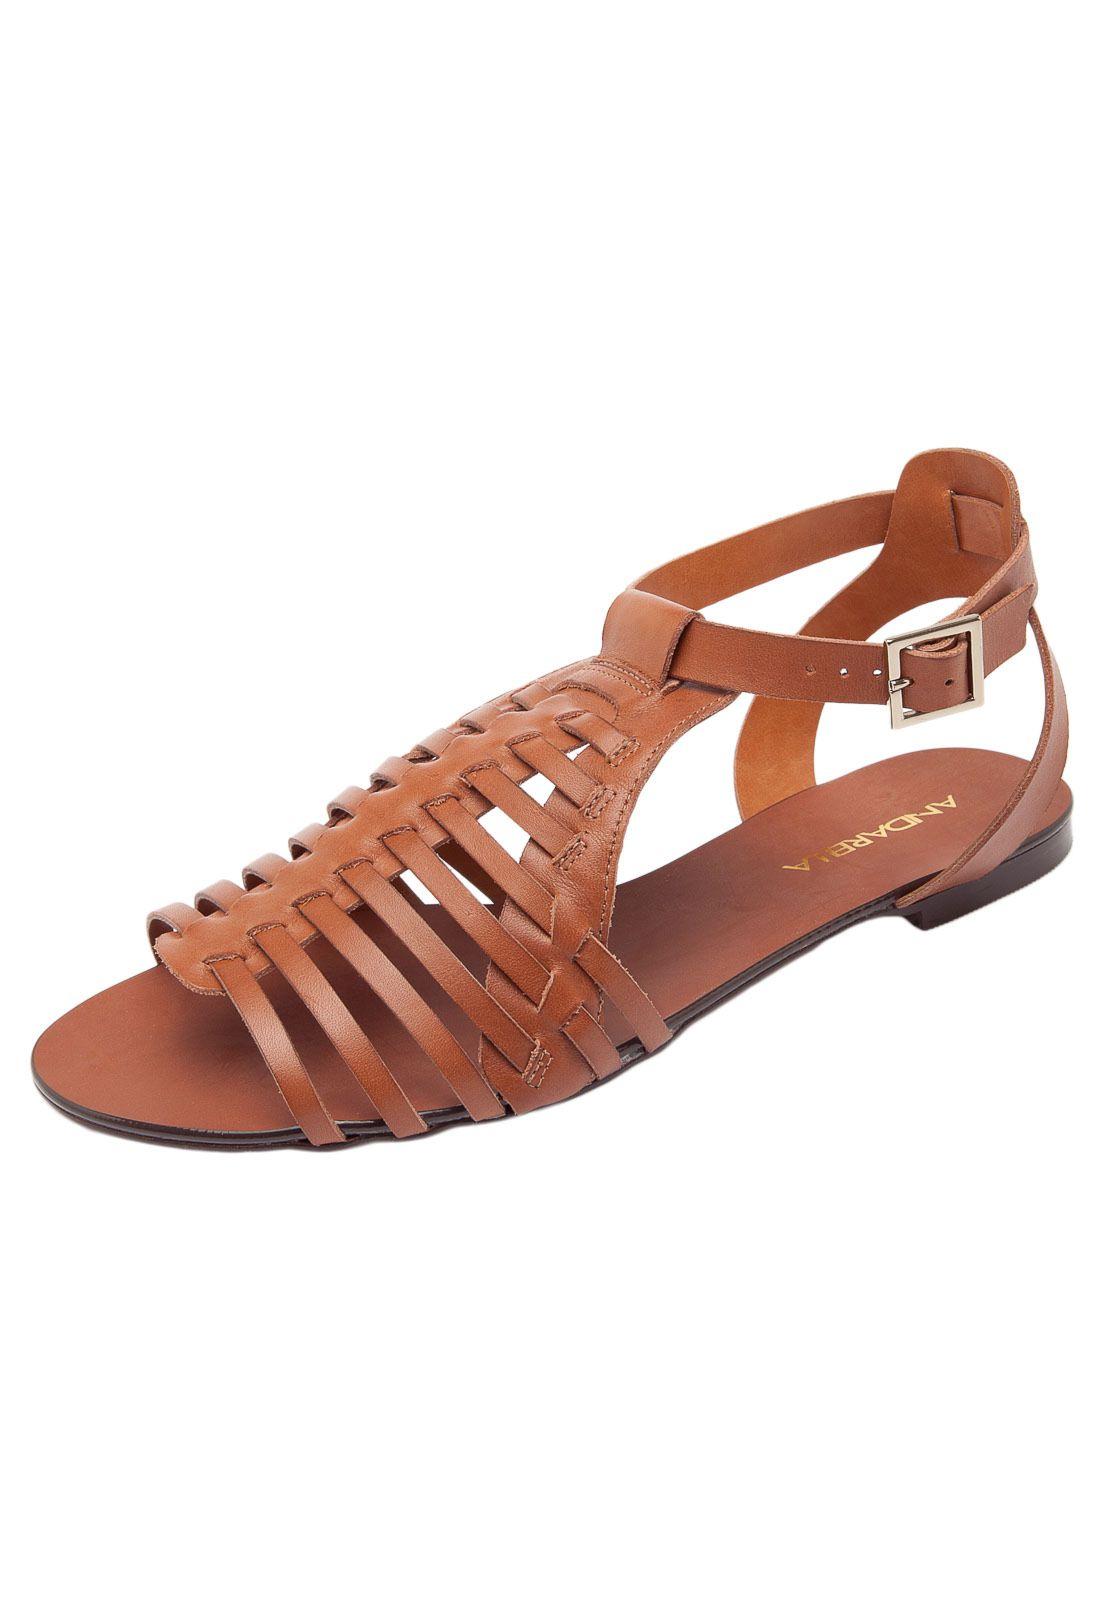 b40a601a3 Sandália Andarella Rasteira Marrom | zandalias | Sandalia, Sapatos ...